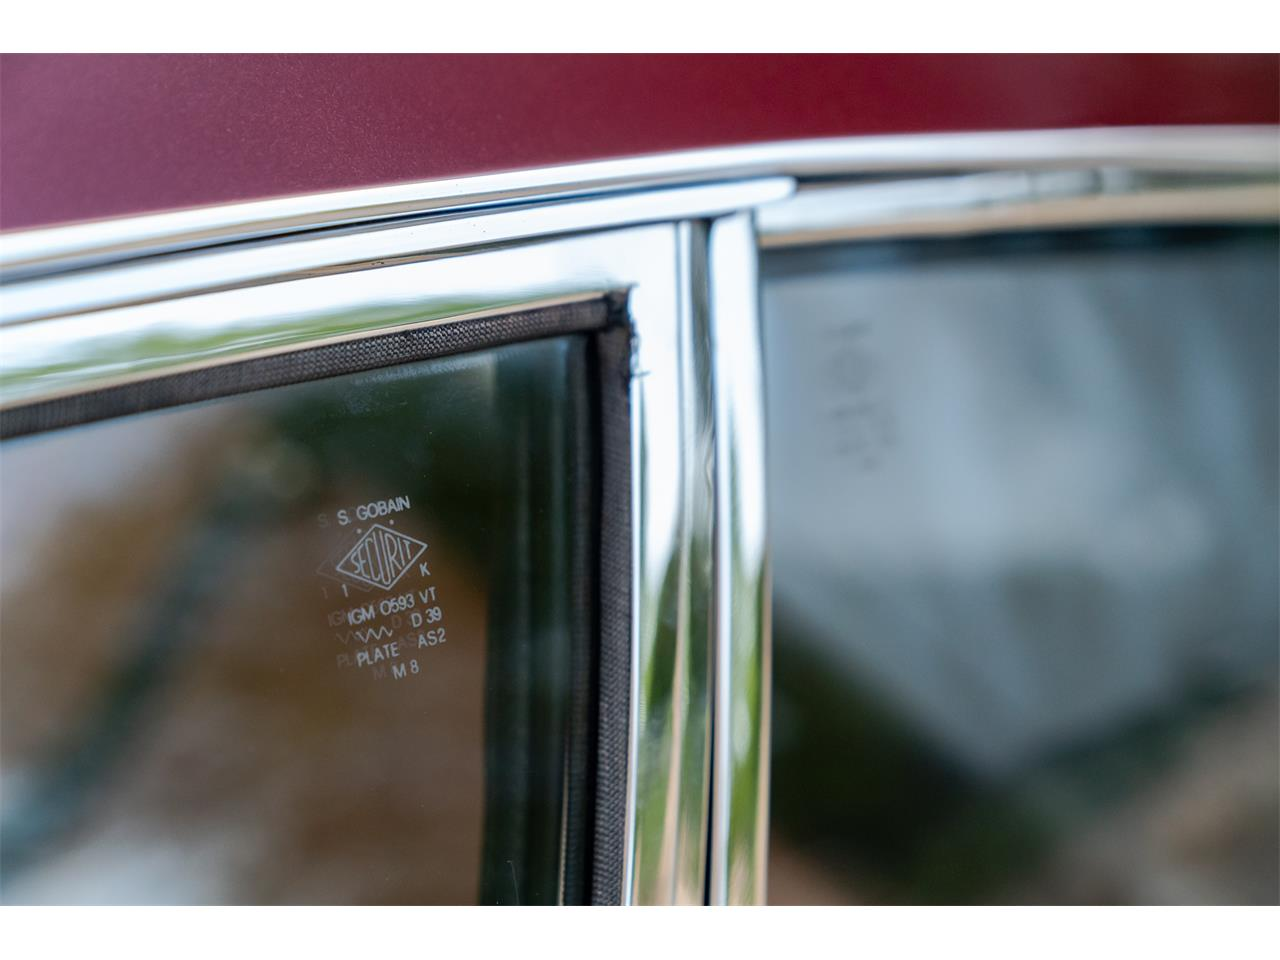 Large Picture of '72 365 GTB/4 Daytona located in Pontiac Michigan - $725,000.00 - QL32